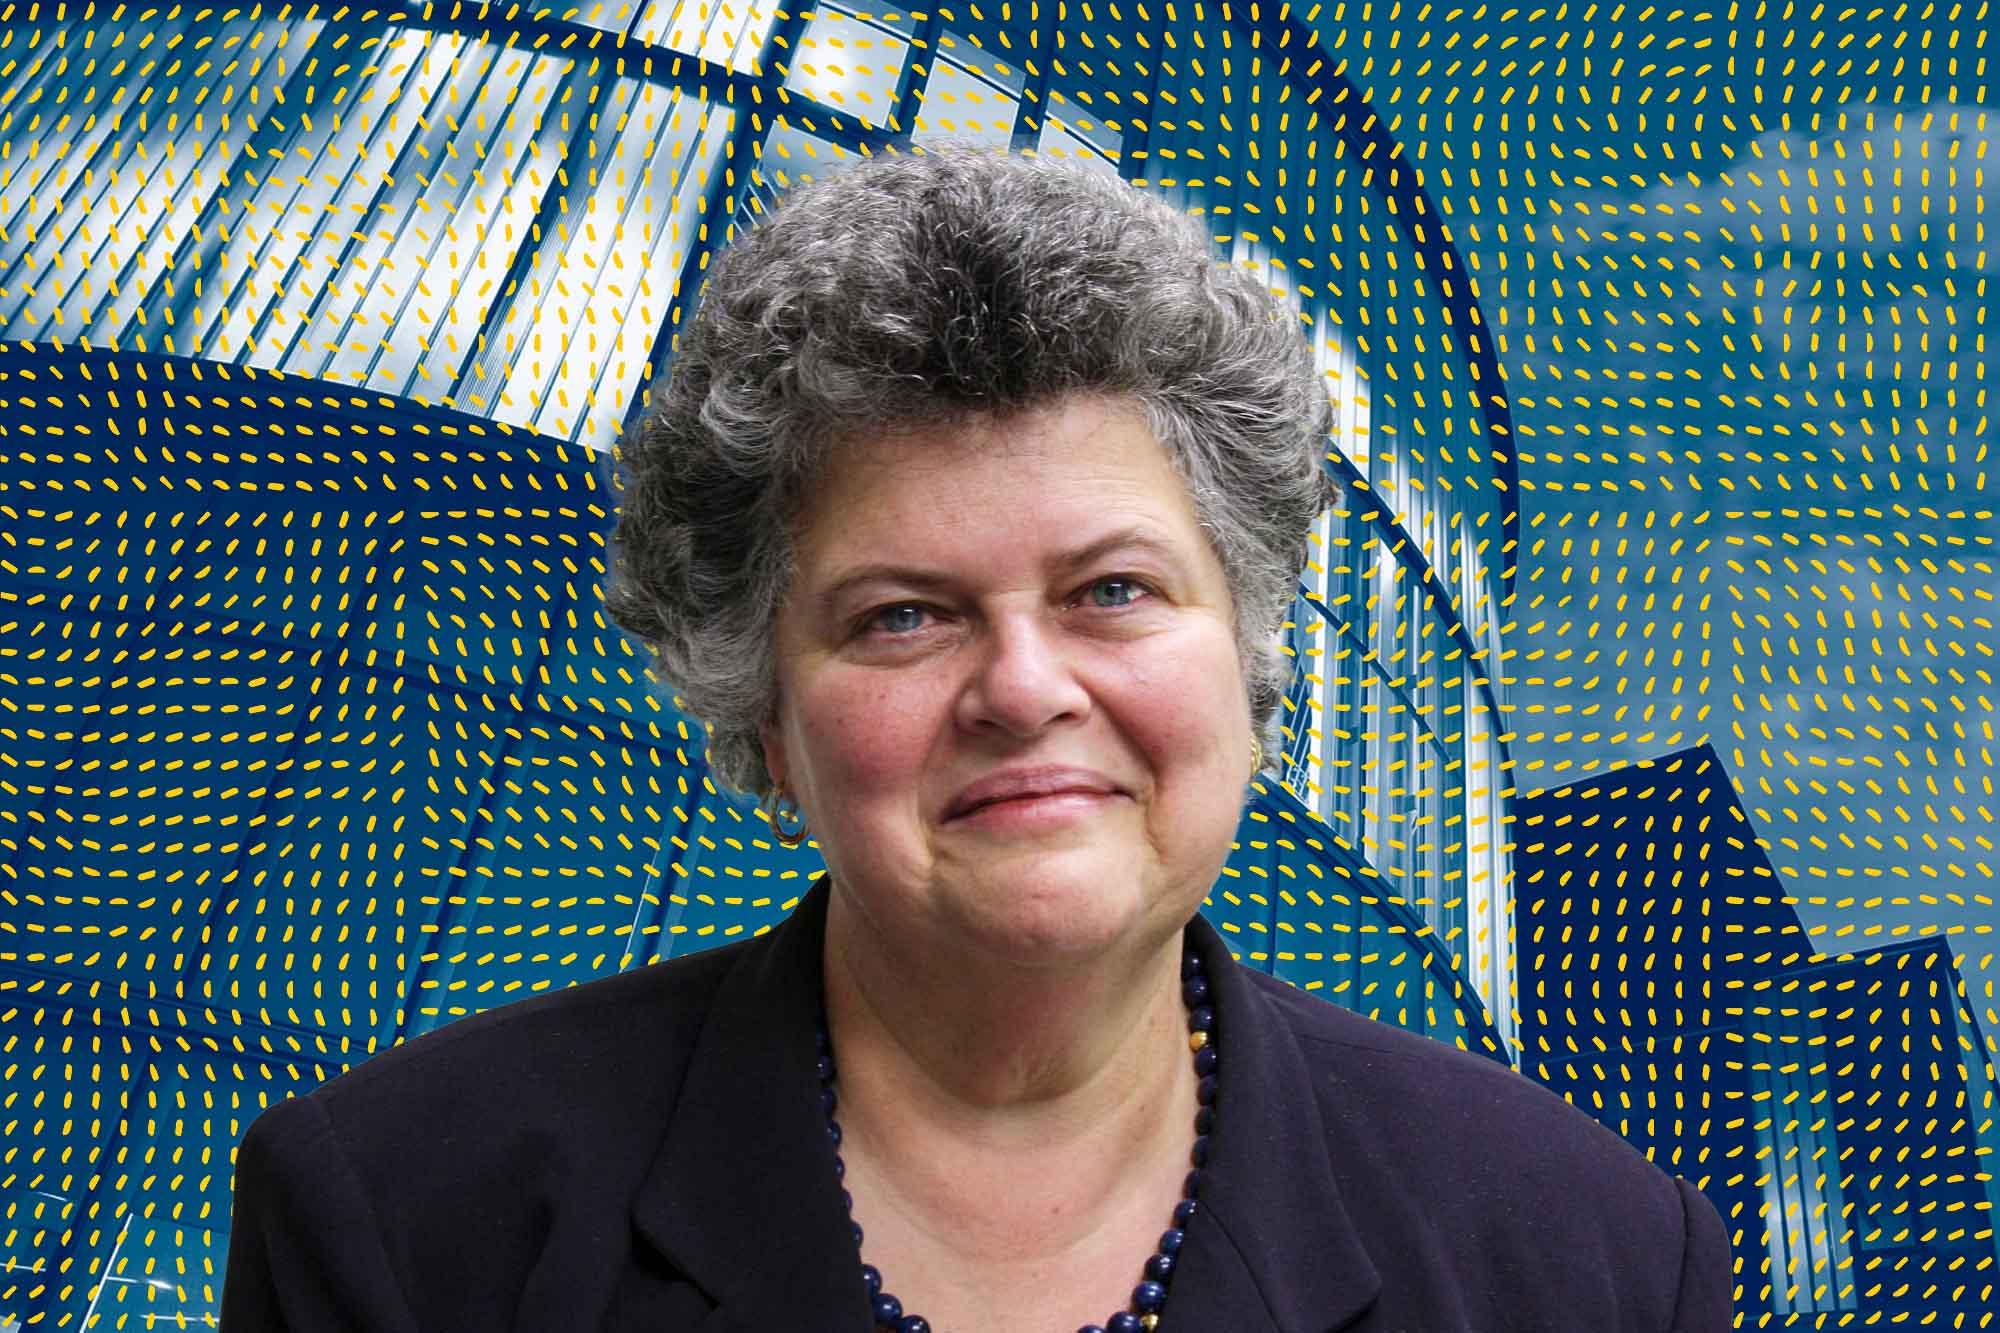 Medical Leader Peggy Shupnik Named Women's Center's 2020 Zintl Award Recipient